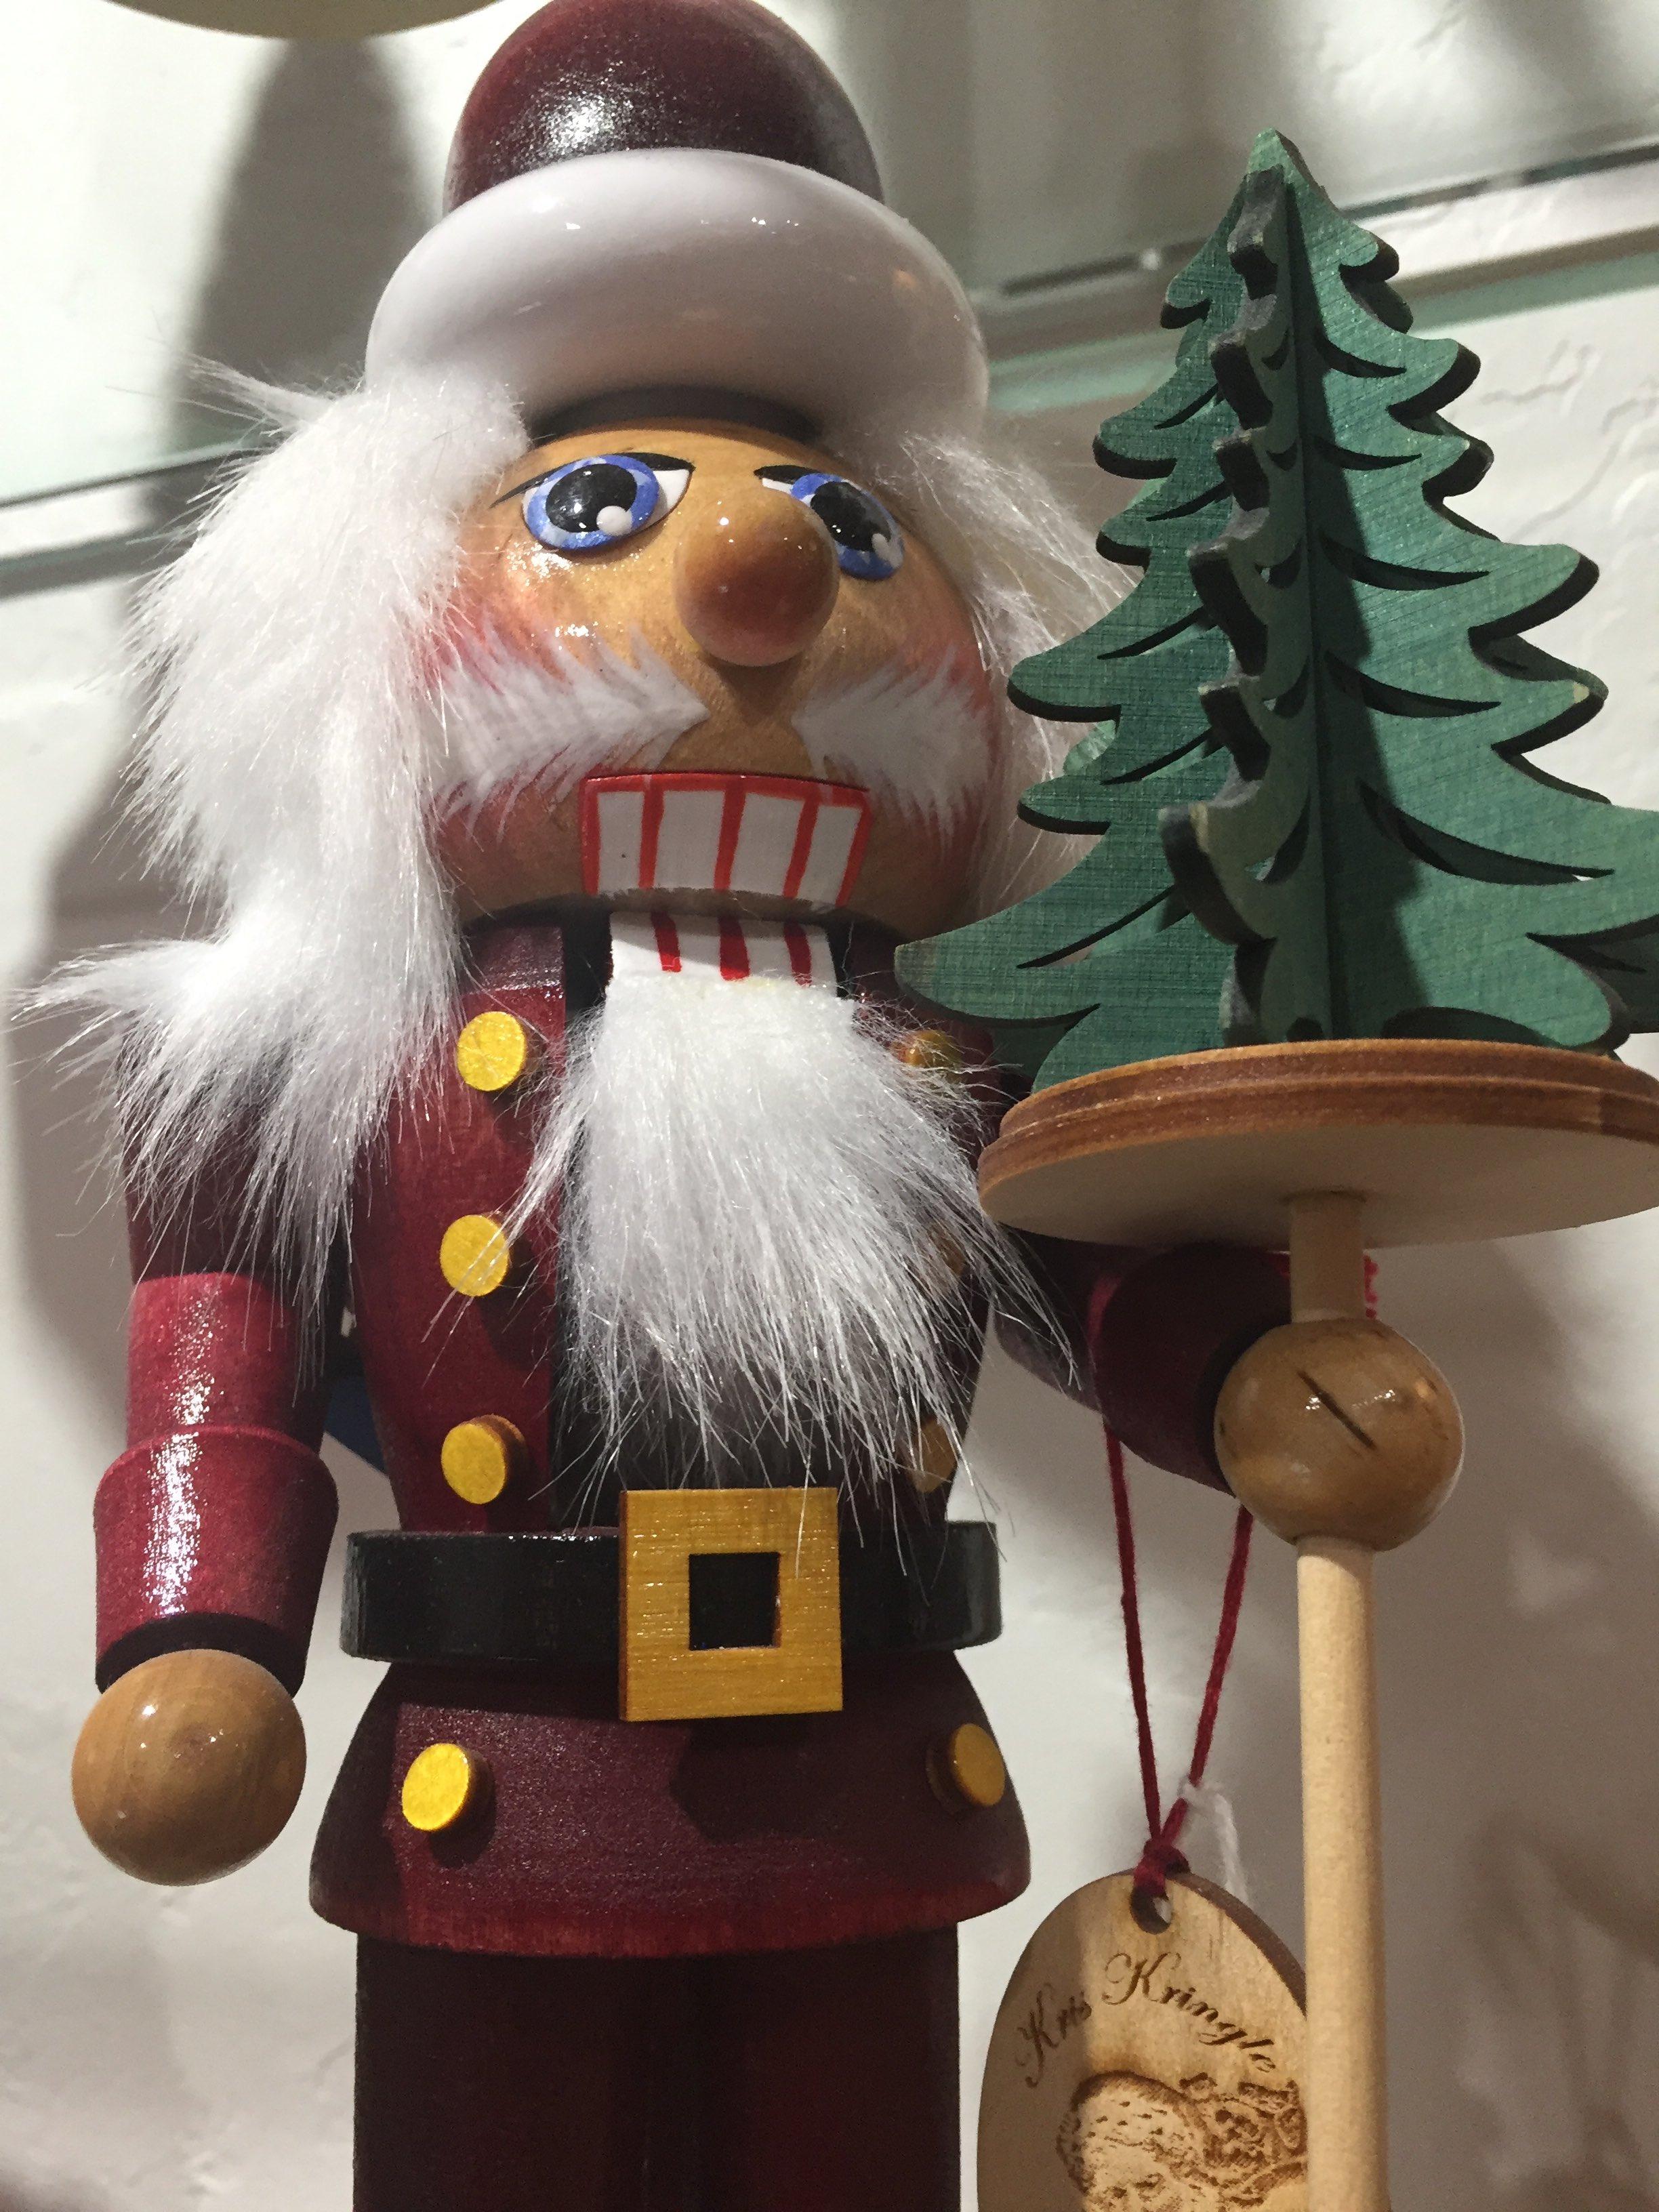 christmas ornaments vail colorado store decorations nutcracker german handcrafted